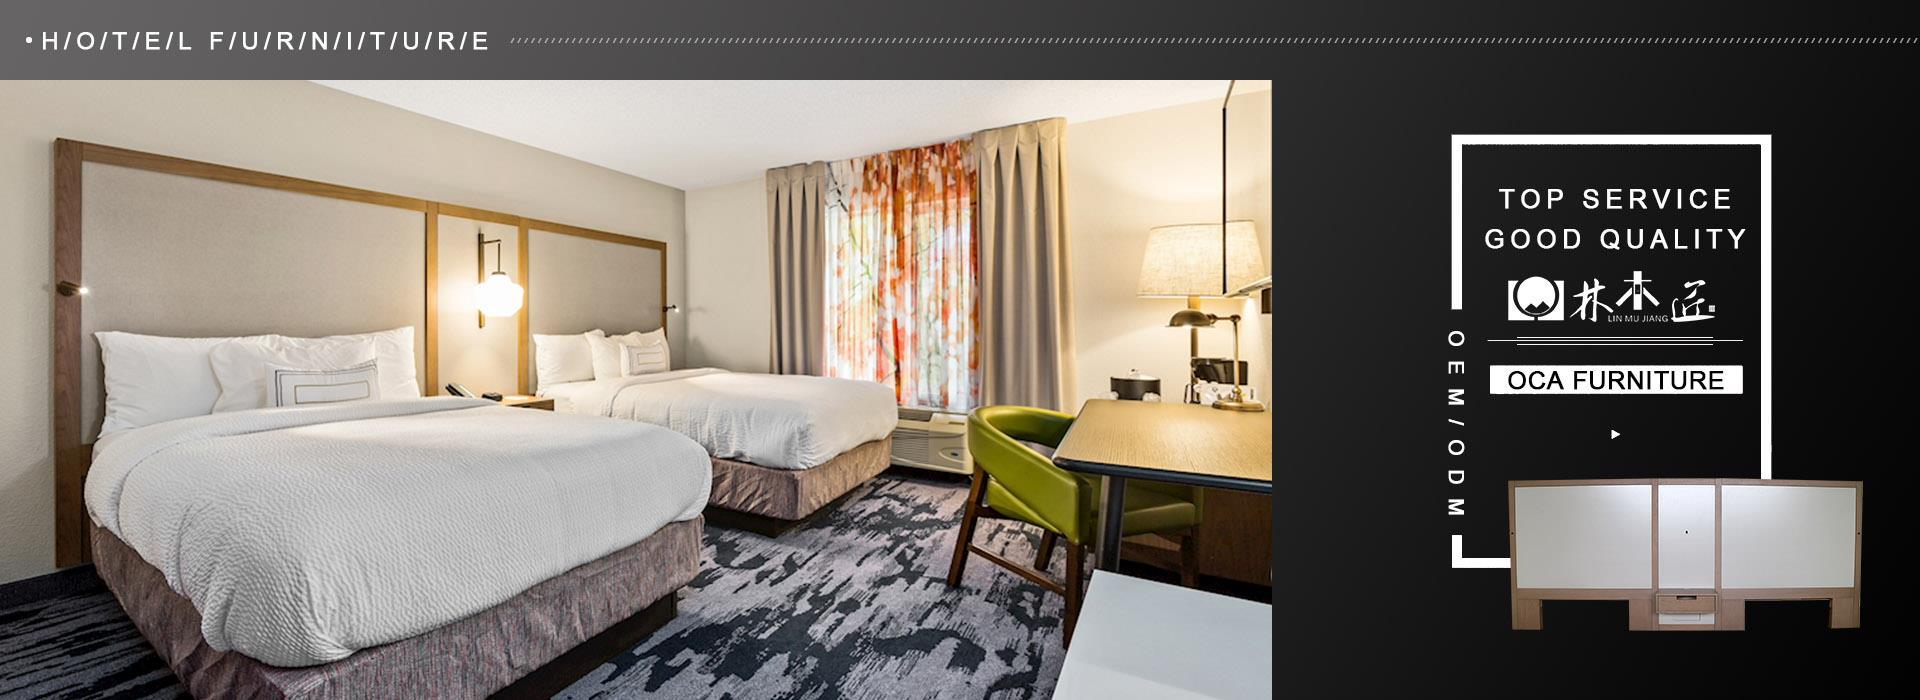 Thailand cheap custom super 8 modern hotel project furniturefashion desgin hotel furniture bangkok